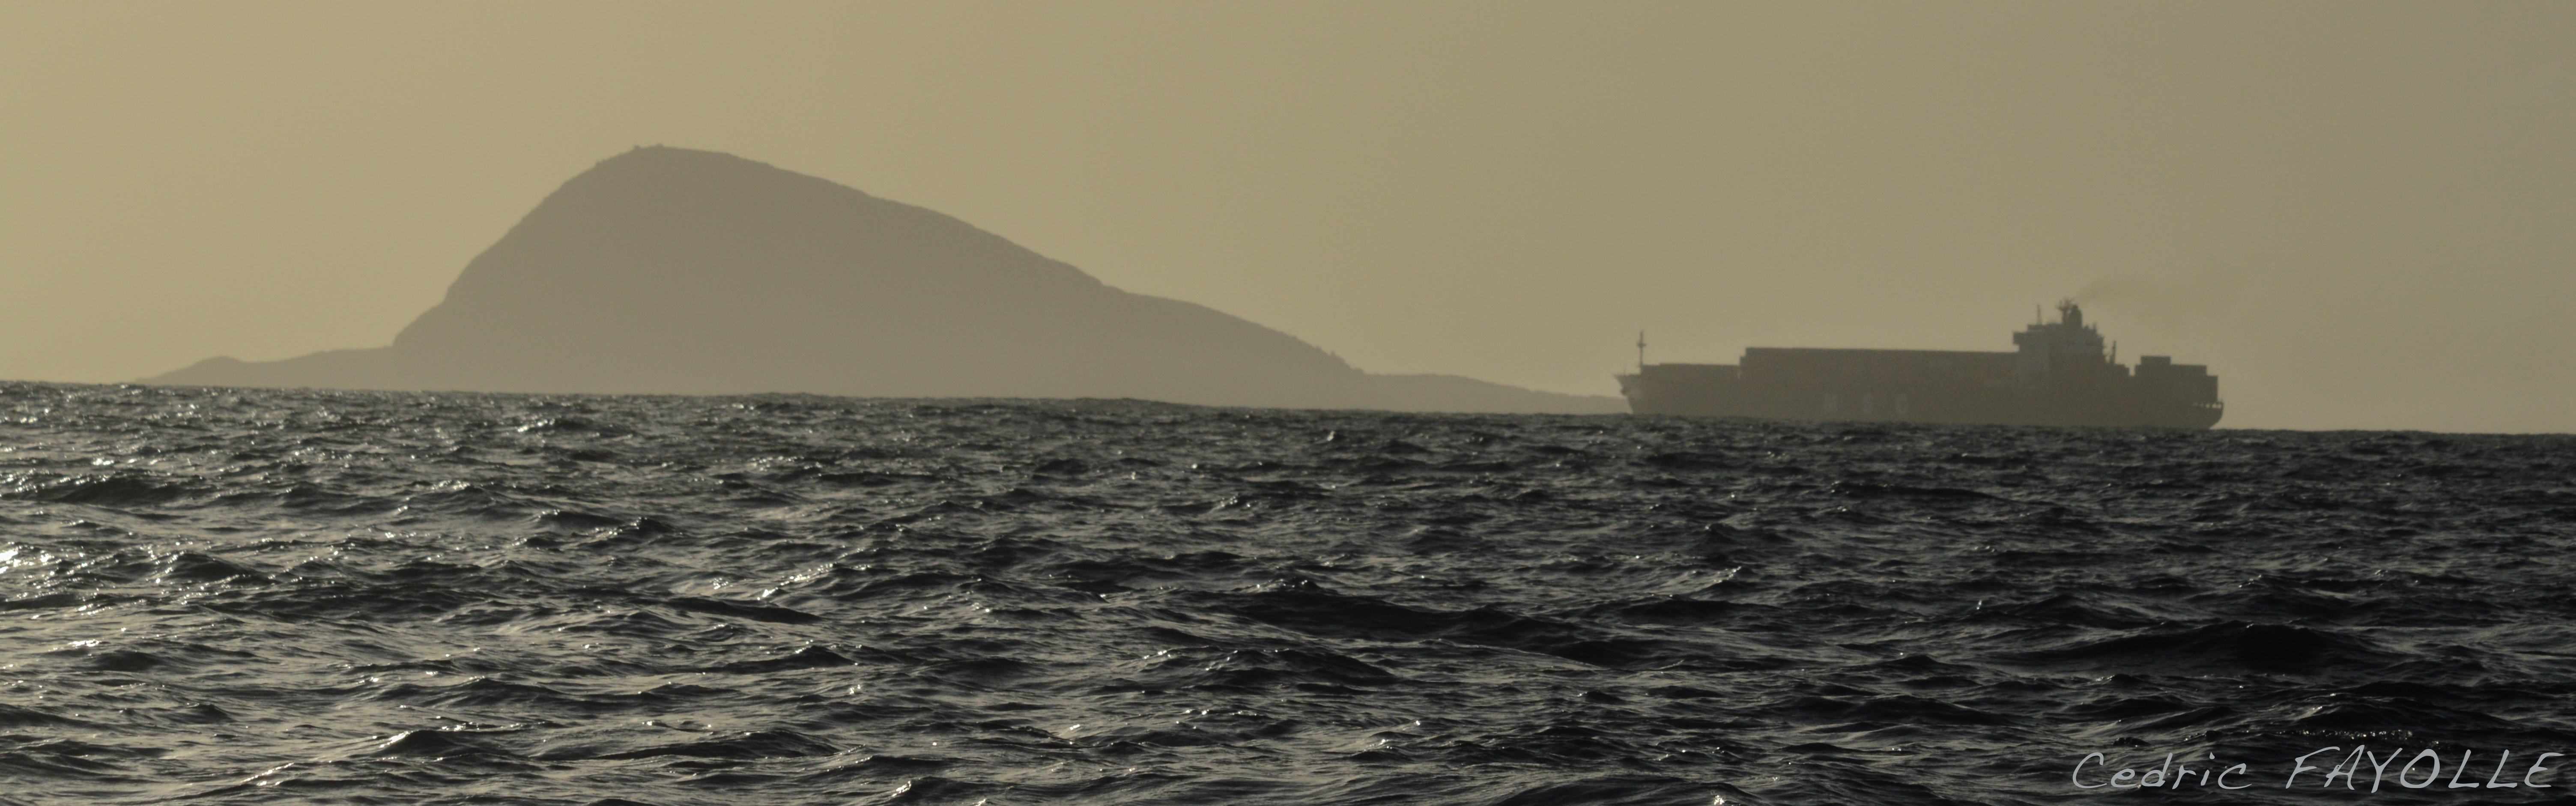 Gunners Island